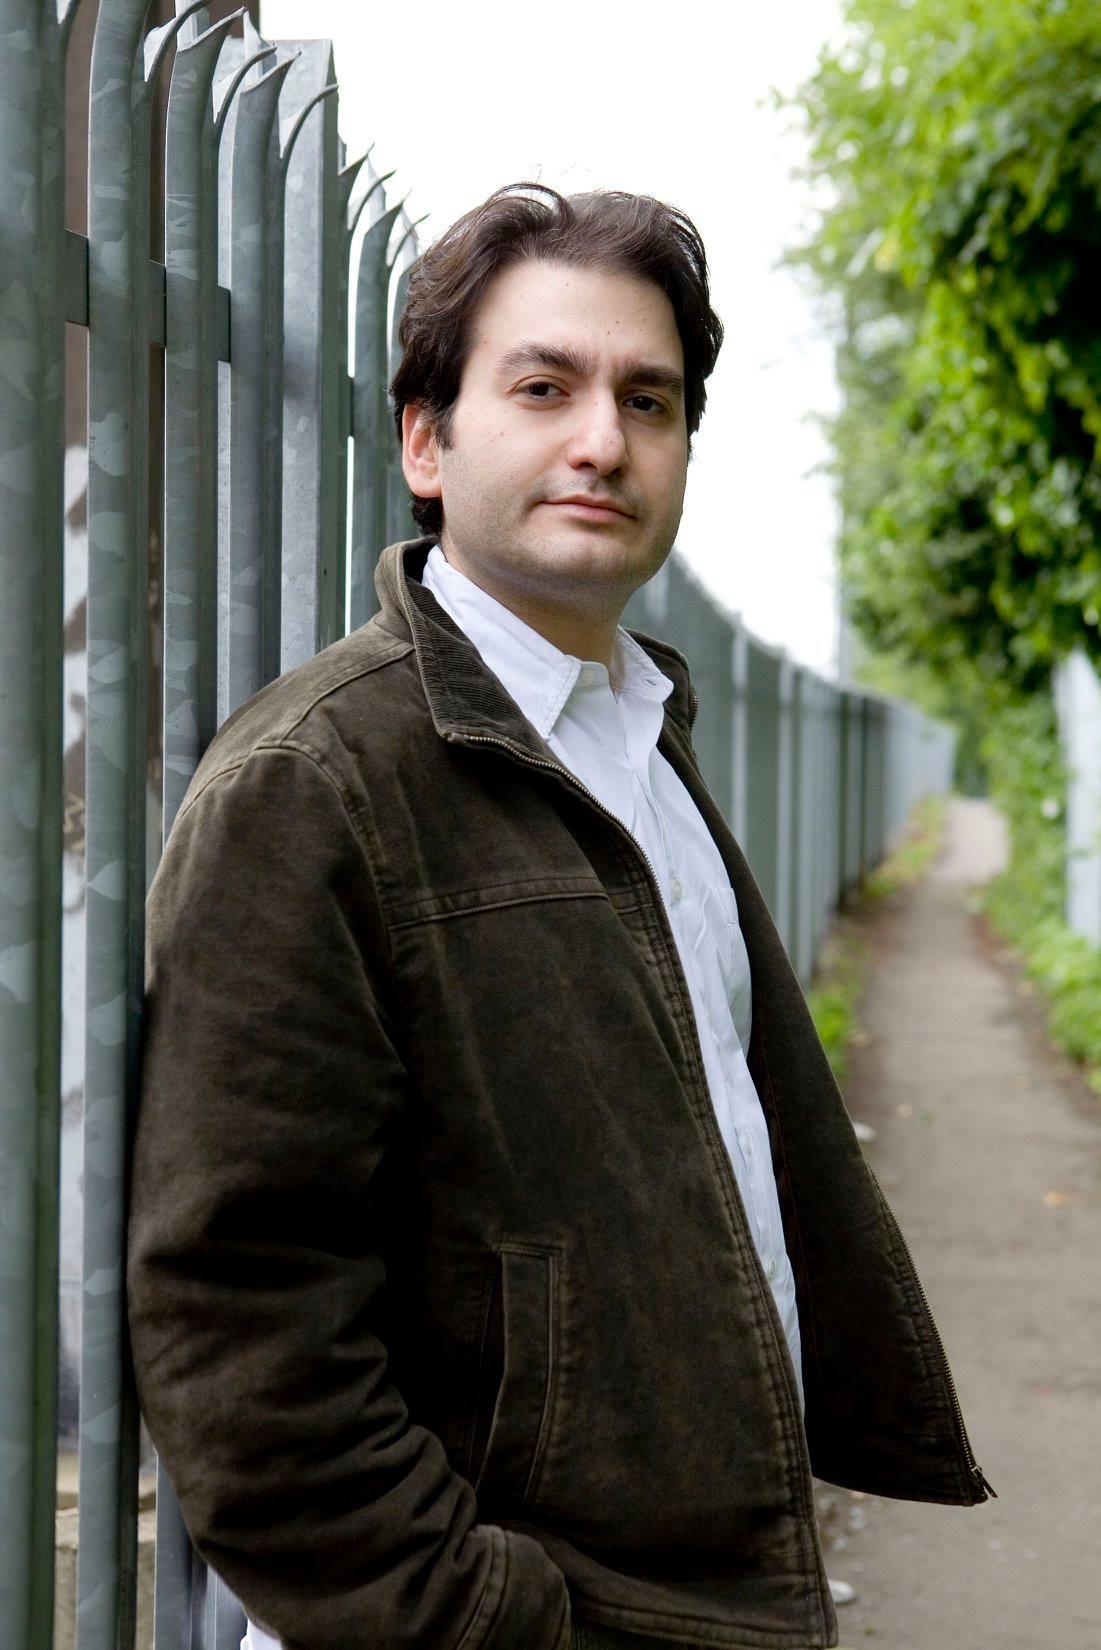 Hassan Abdulrazzak | LAILA PINES...